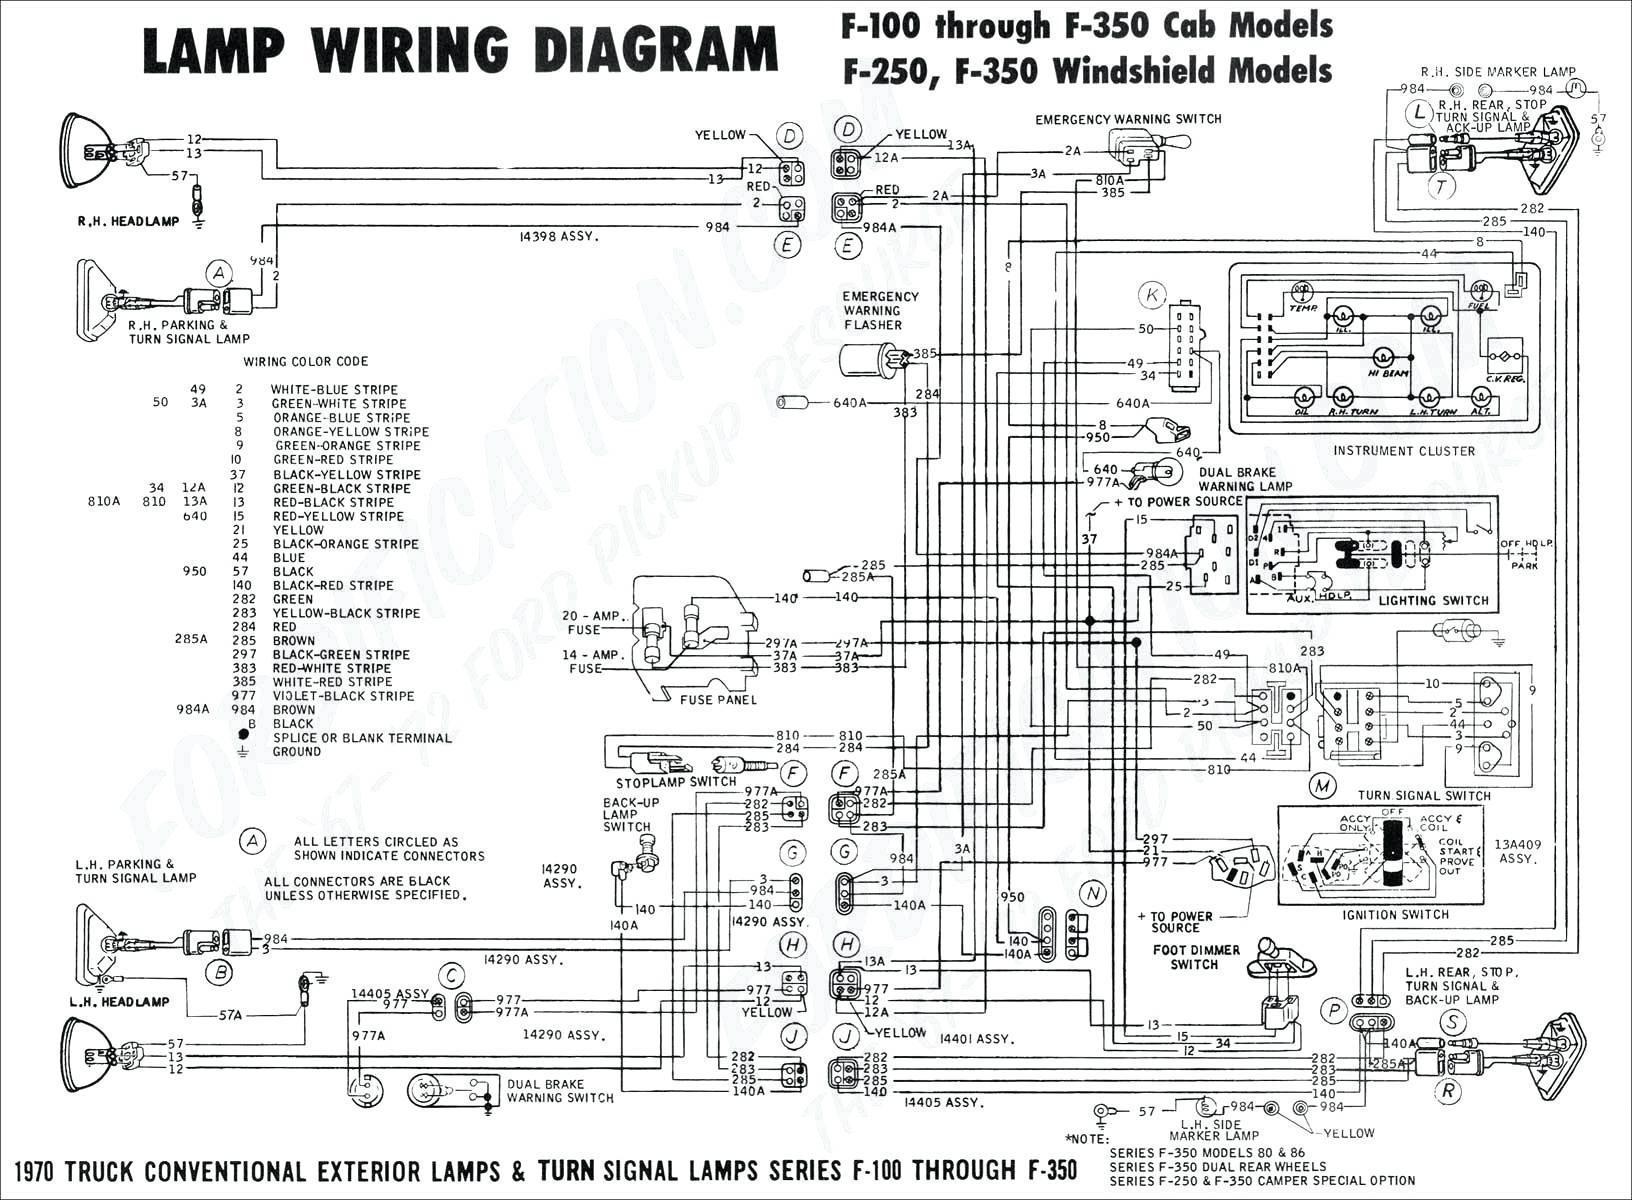 1996 monte carlo wiring diagram